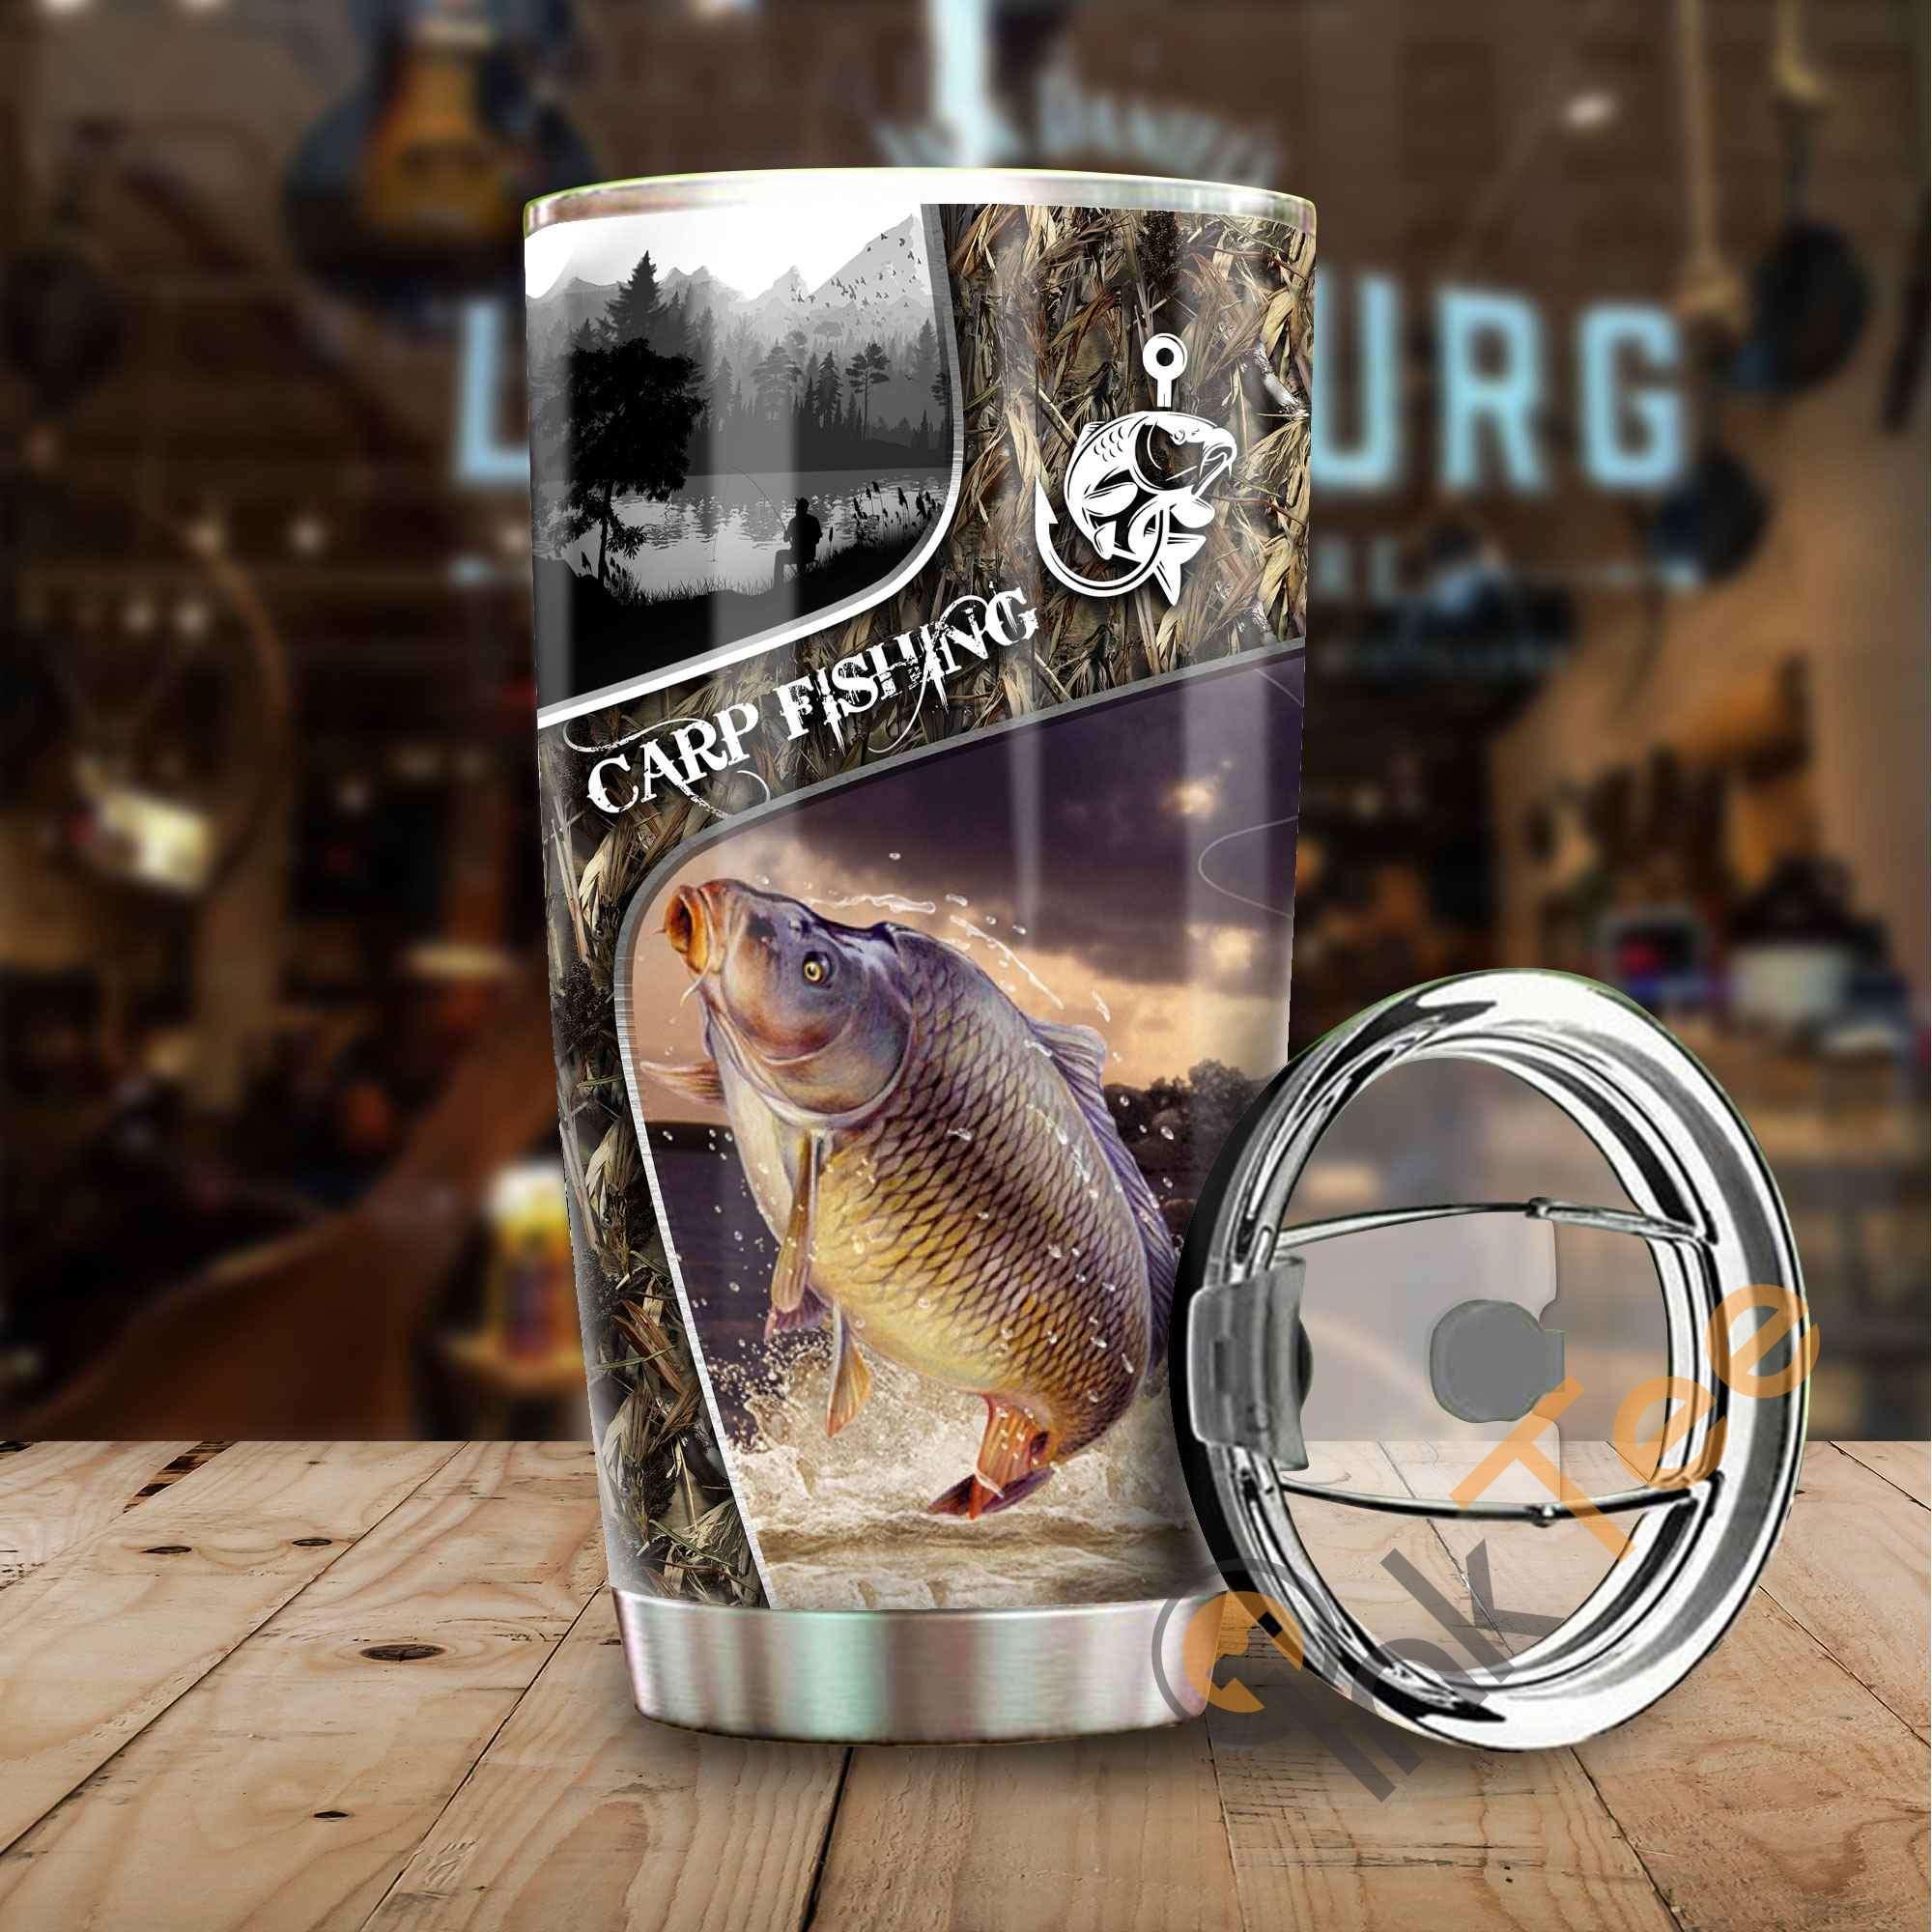 Carp Fishing Camo Amazon Best Seller Sku 3223 Stainless Steel Tumbler